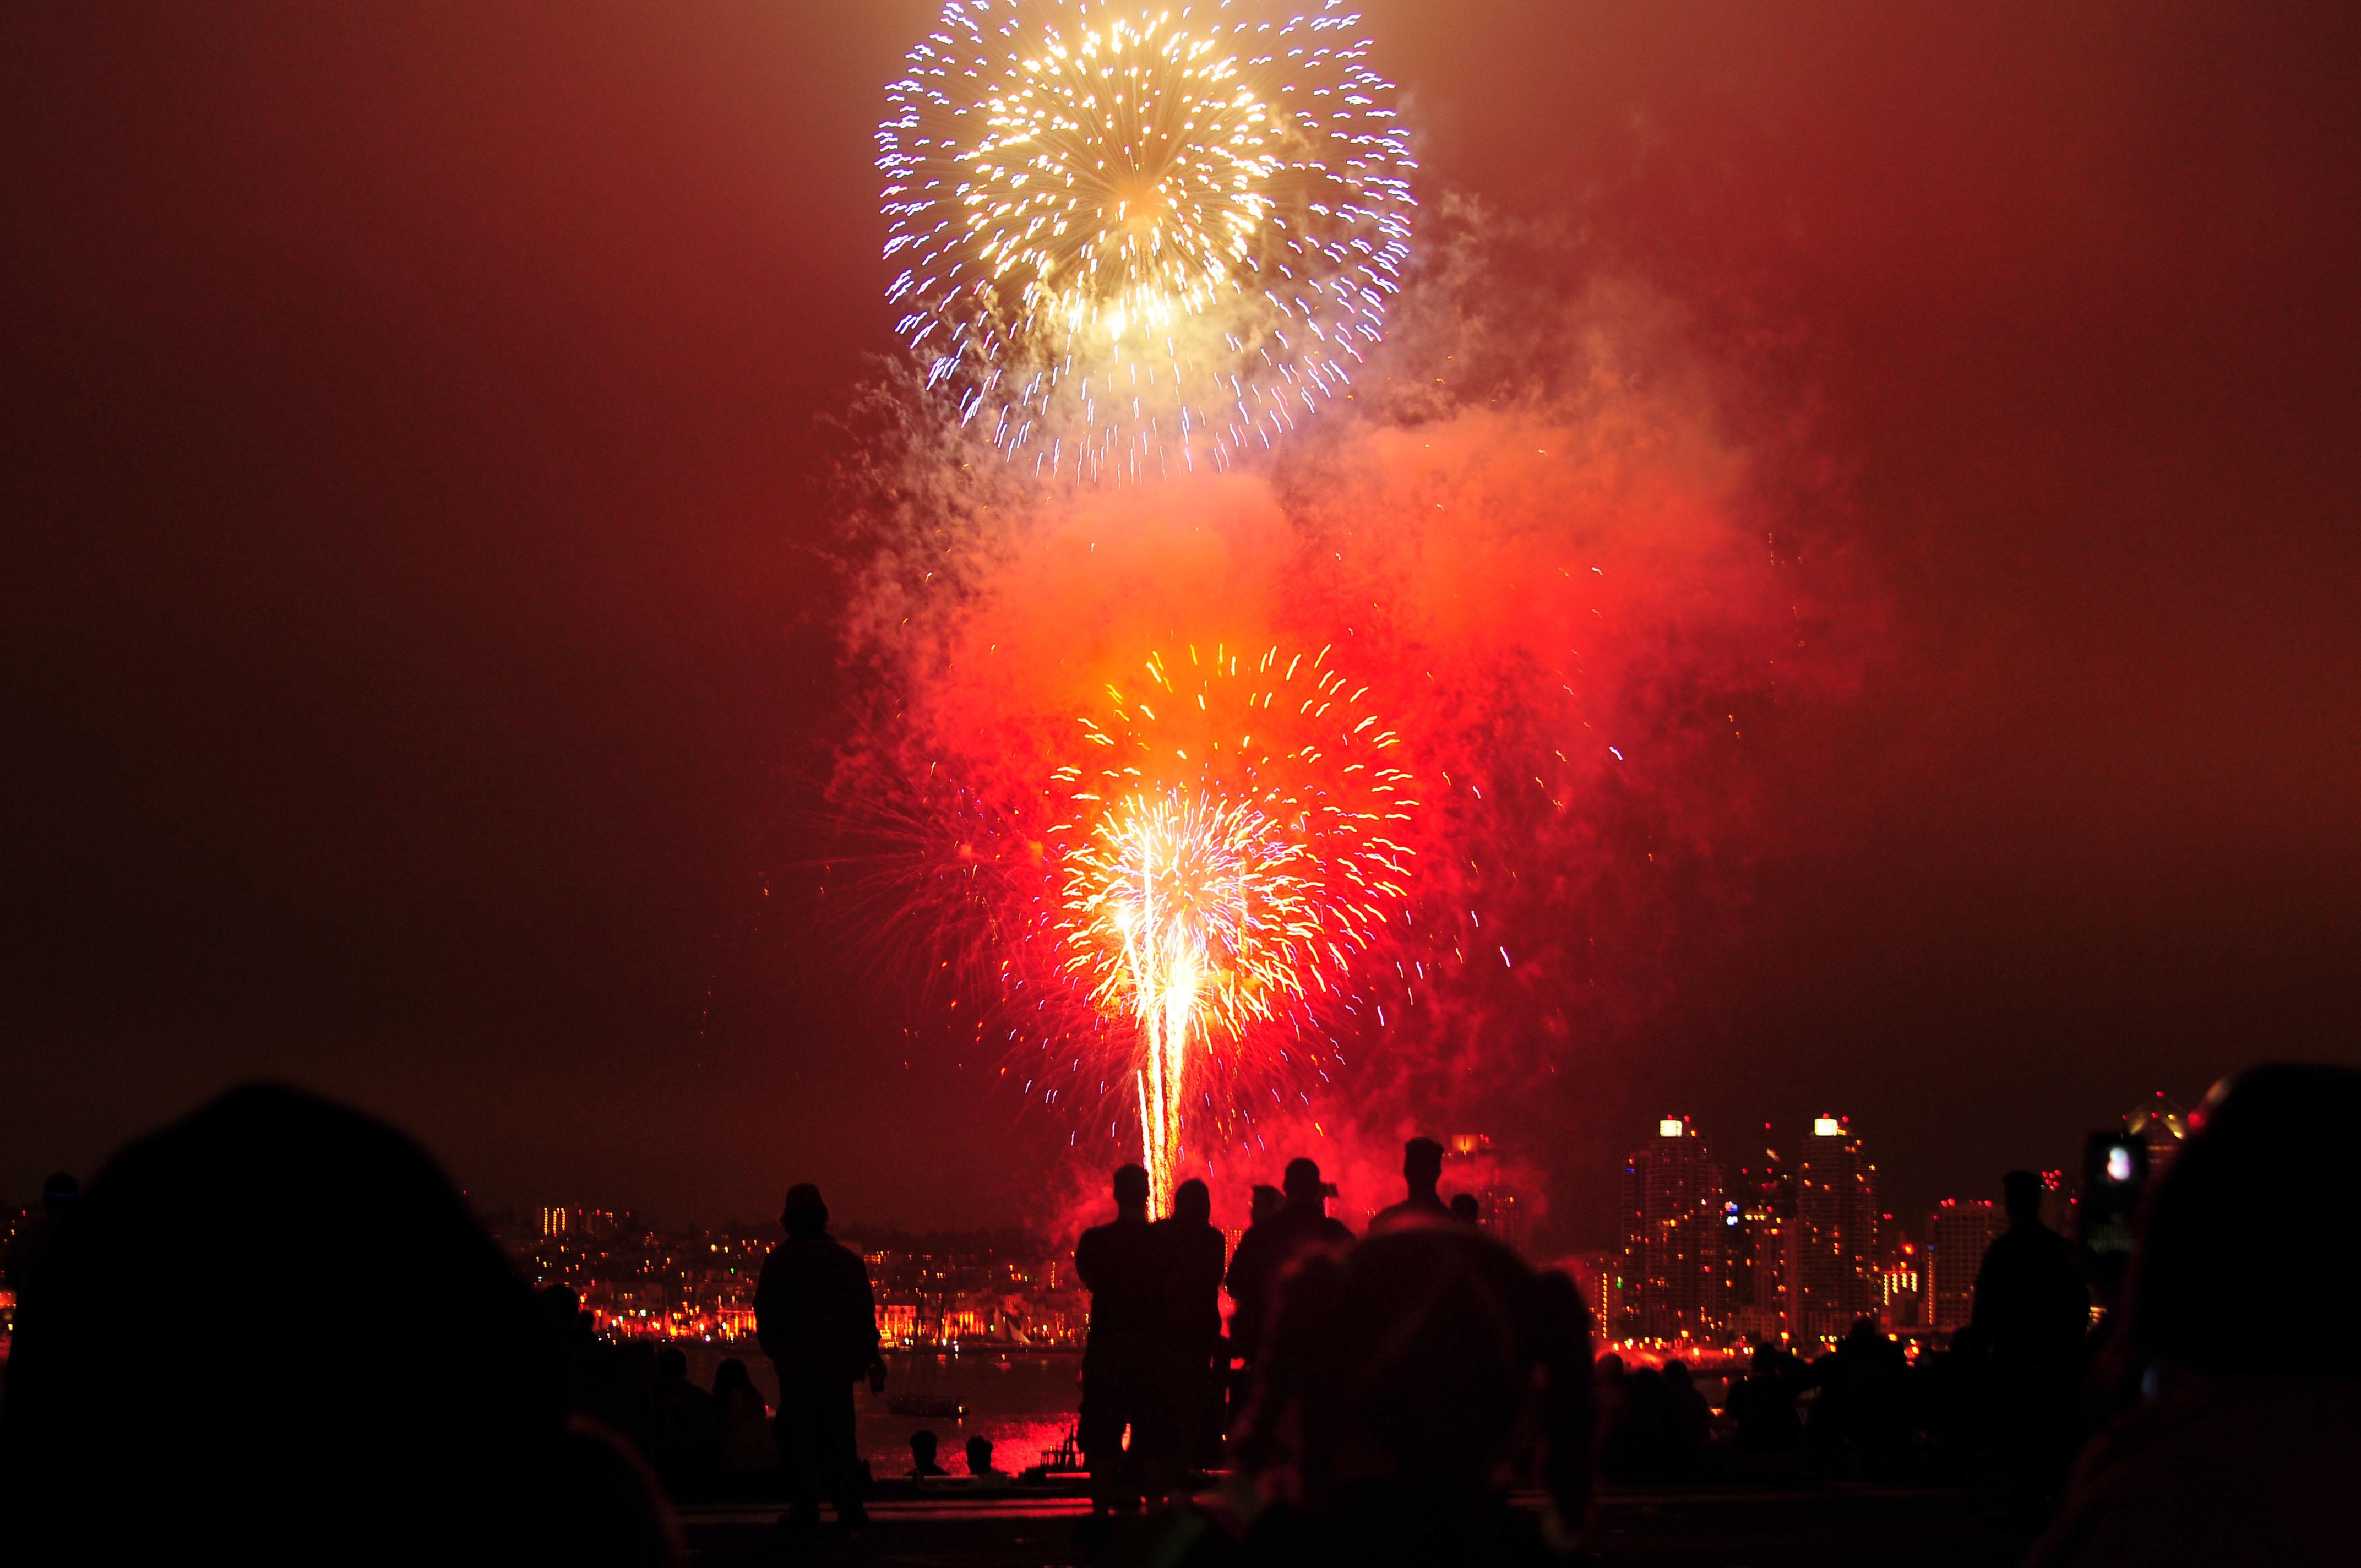 moving fireworks